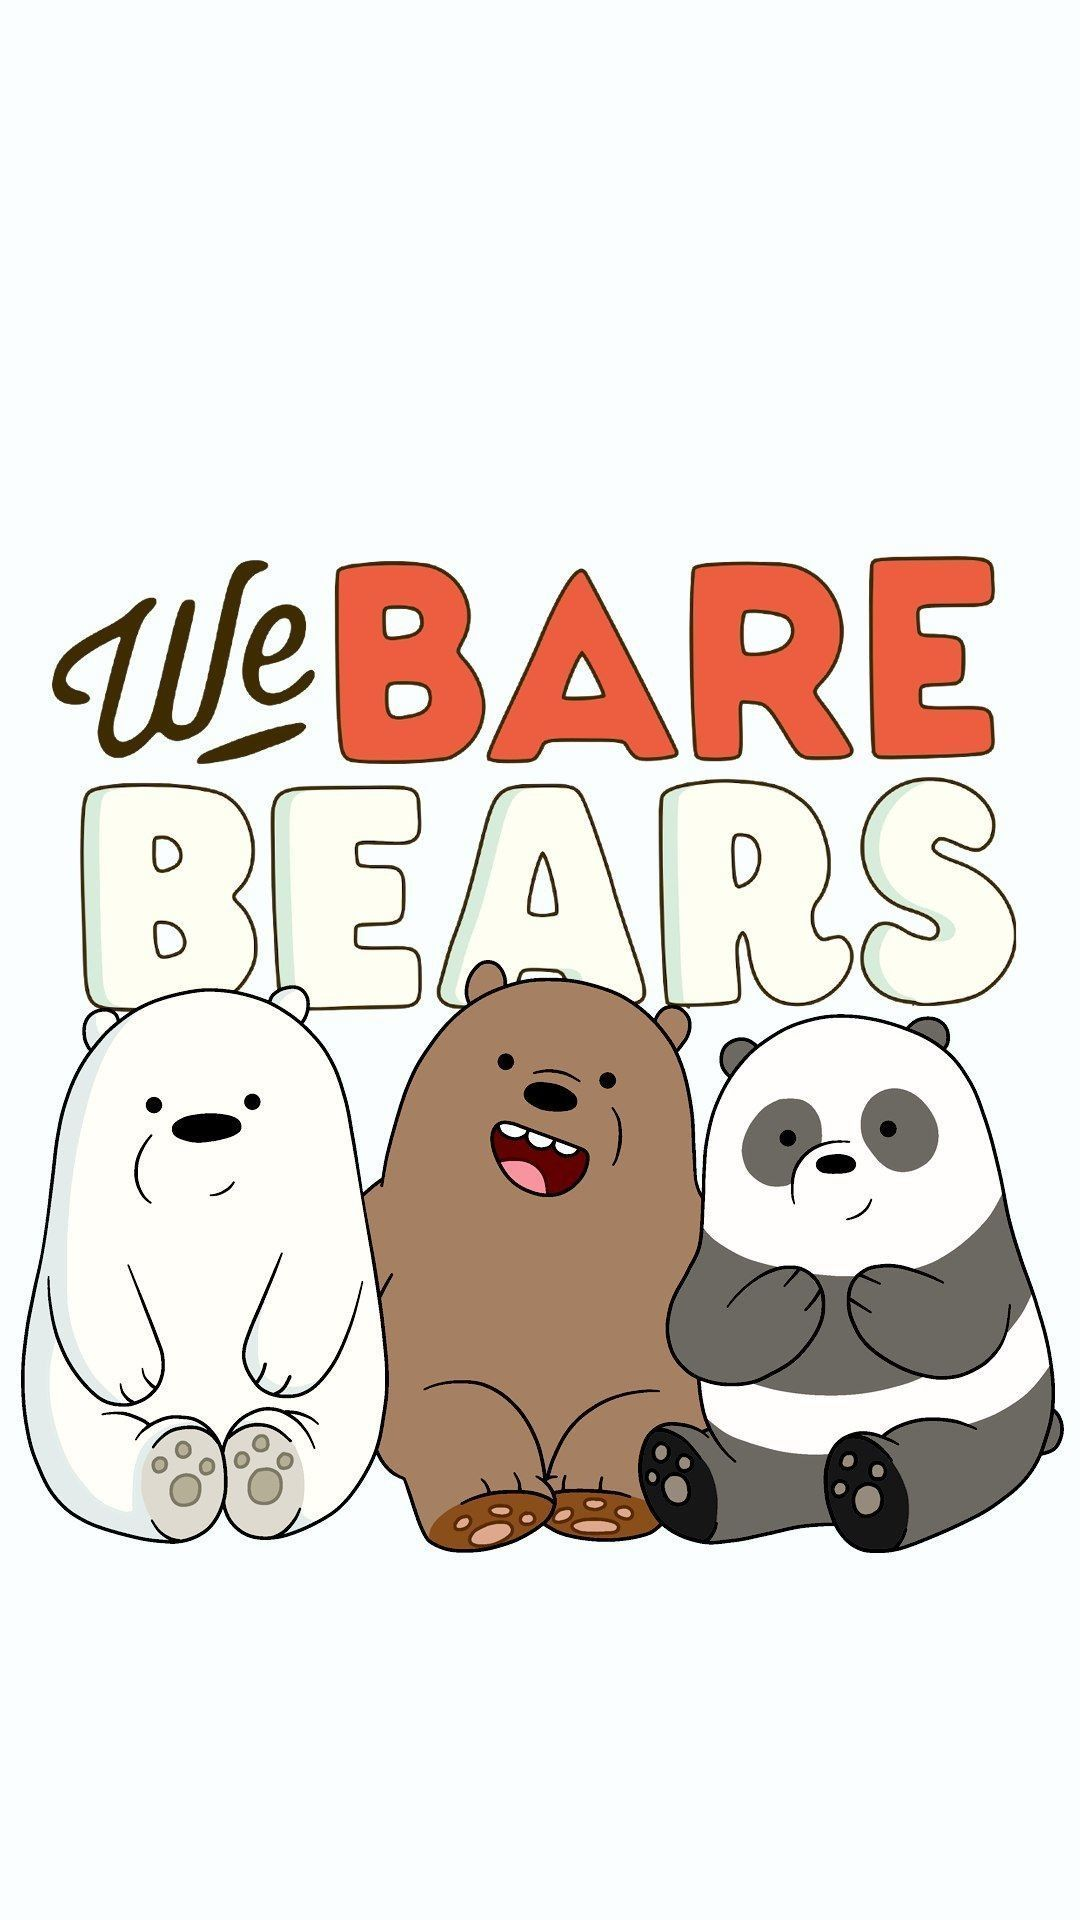 #cartoon #cartoons #aesthetic #webarebears #we #bare #